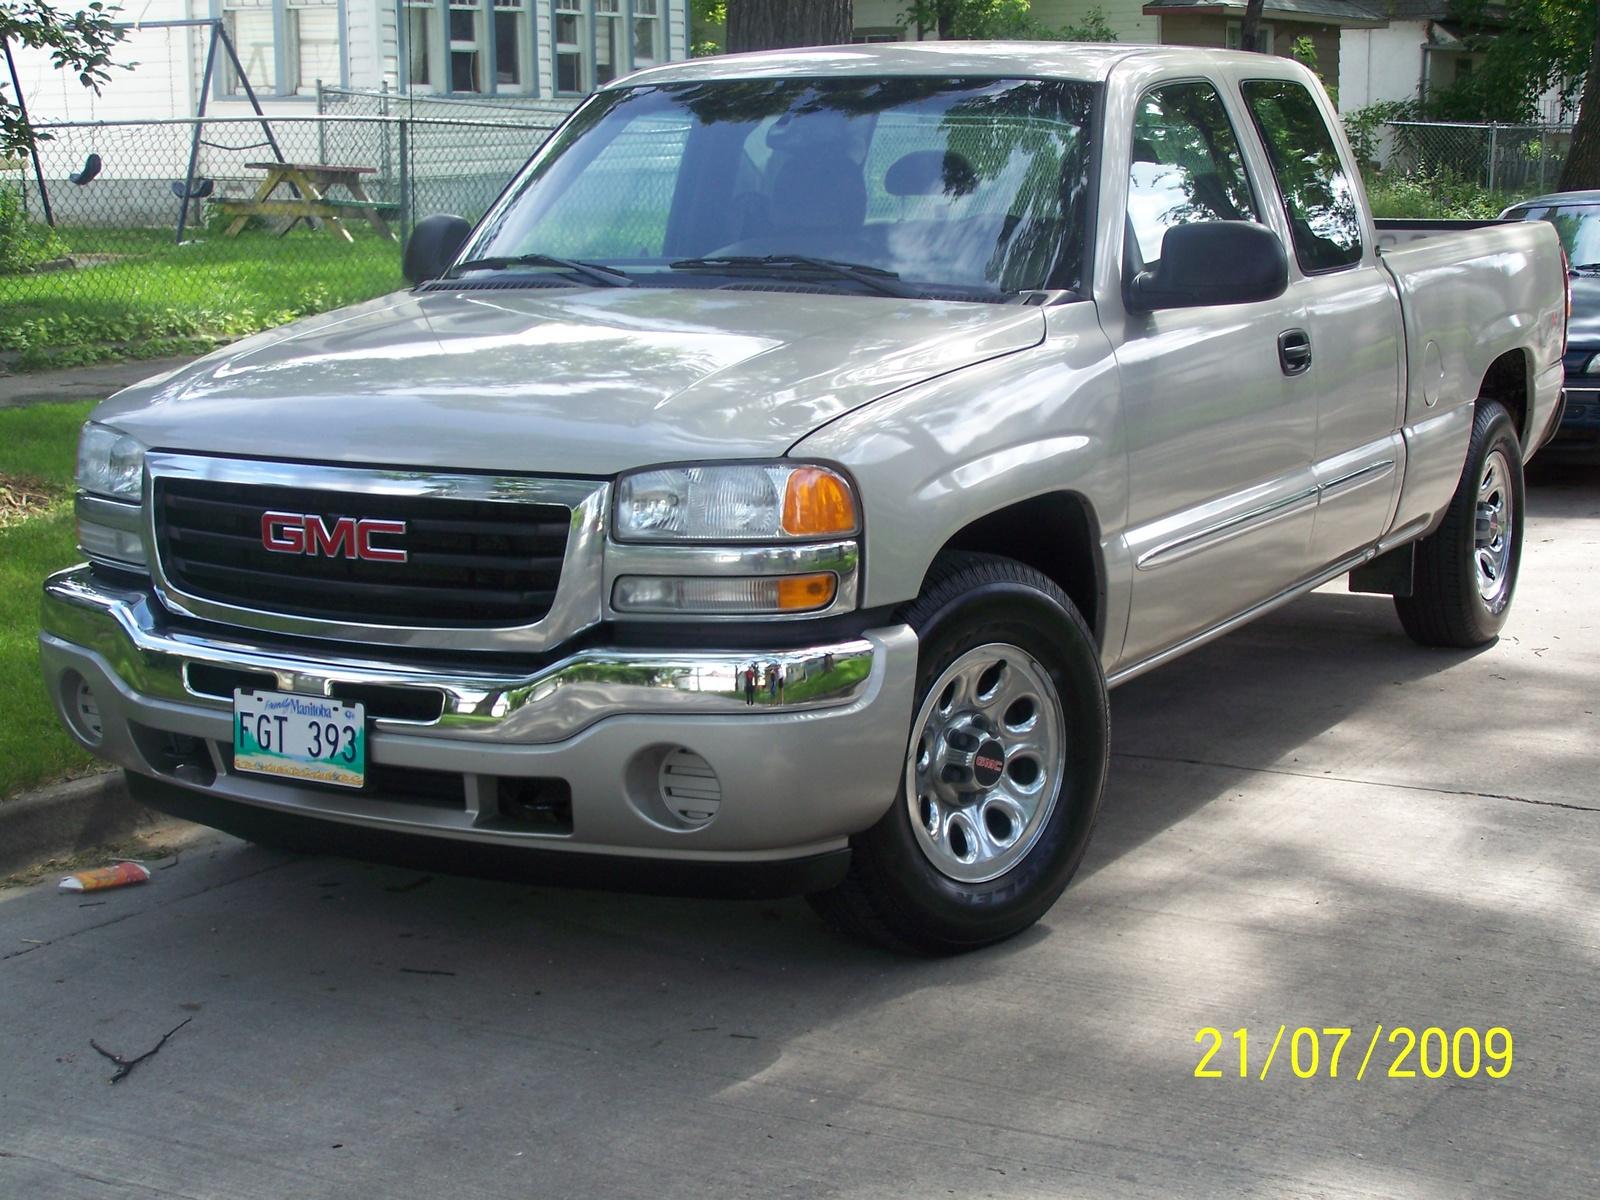 Gmc 1500 >> 2006 GMC SIERRA 1500 - Image #3